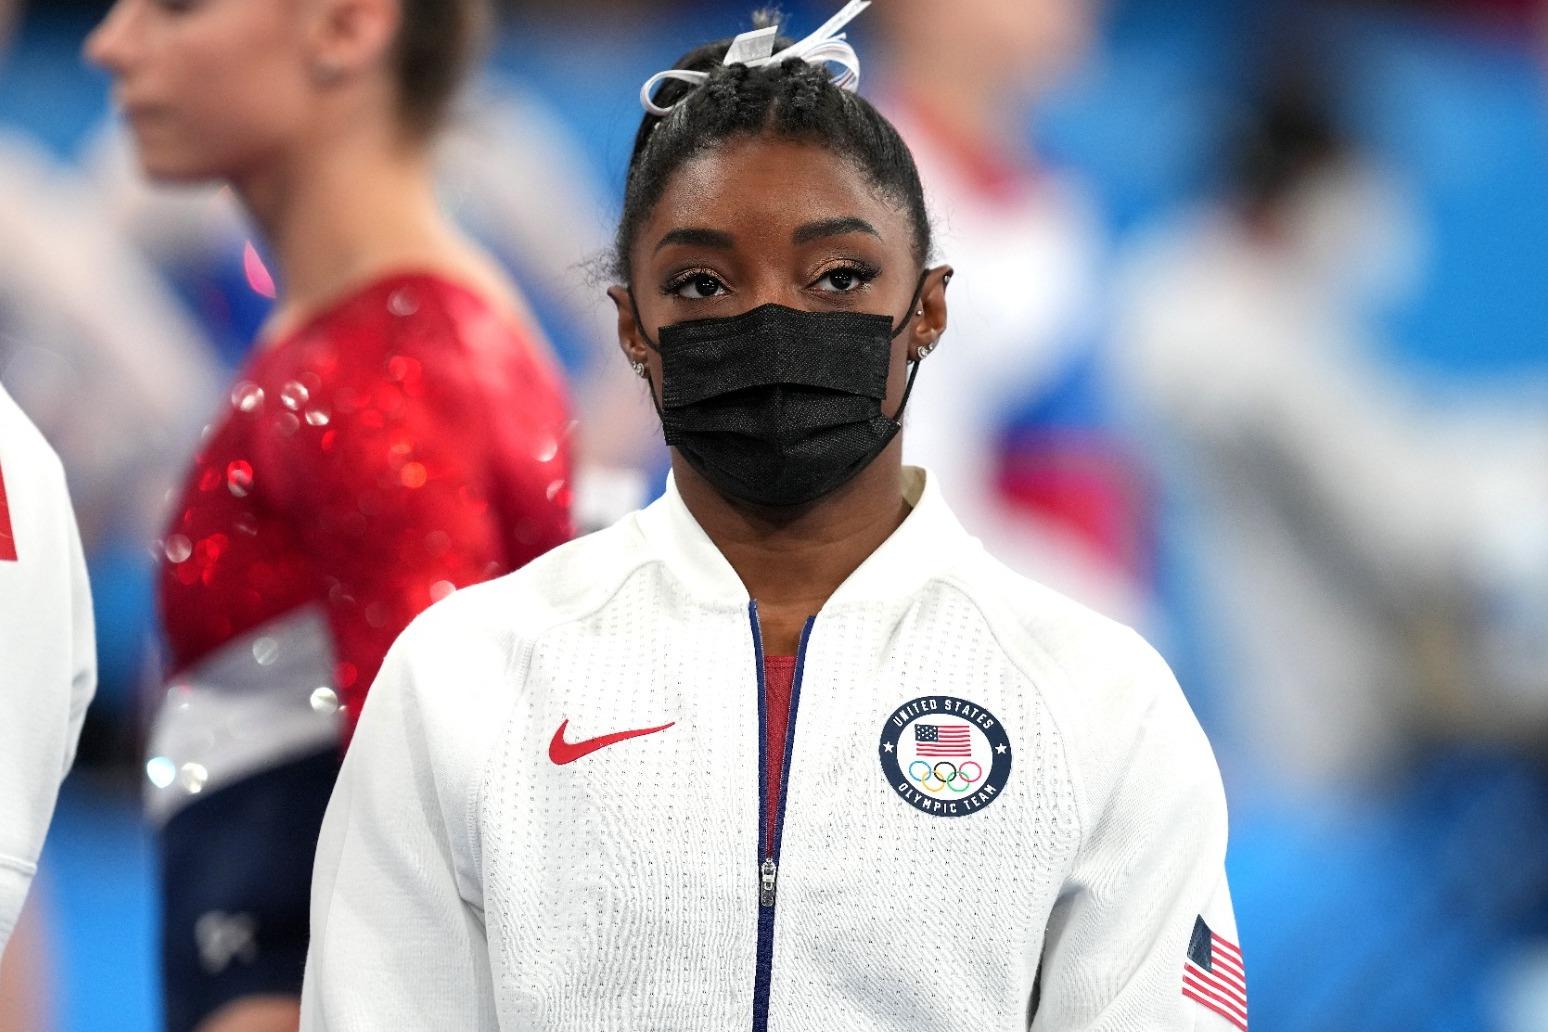 Olympian Simone Biles praised for speaking openly on mental health struggles